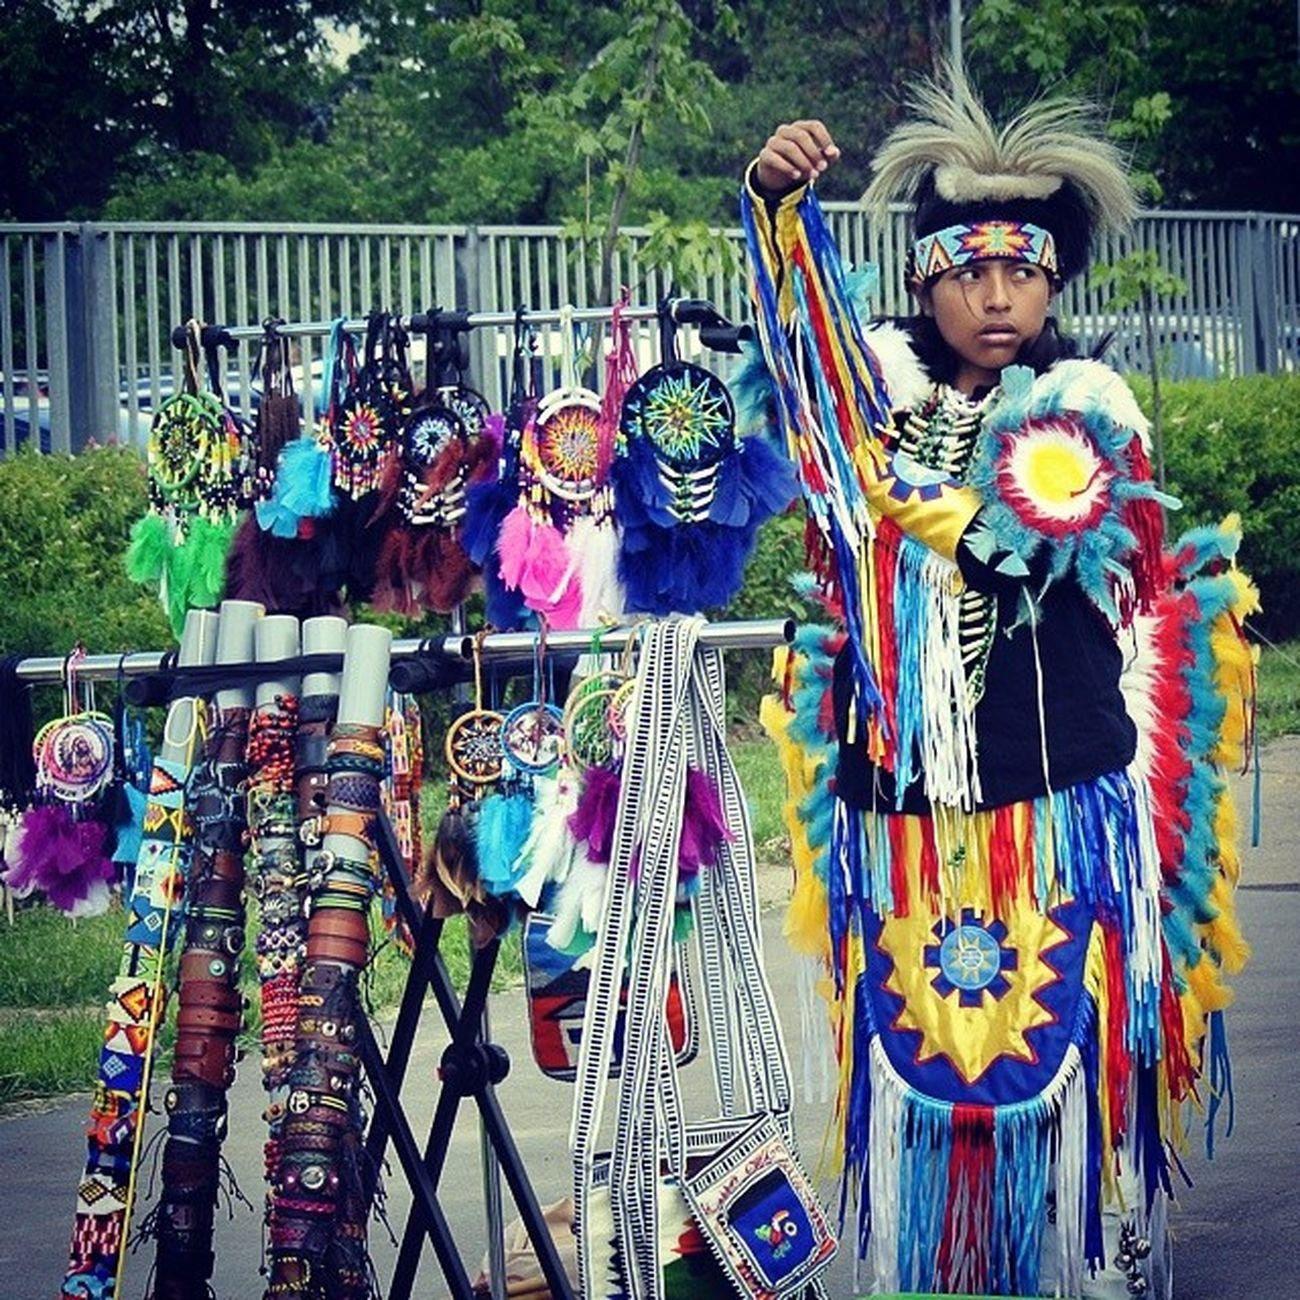 Injun индейцы Instantphoto Streetseller art